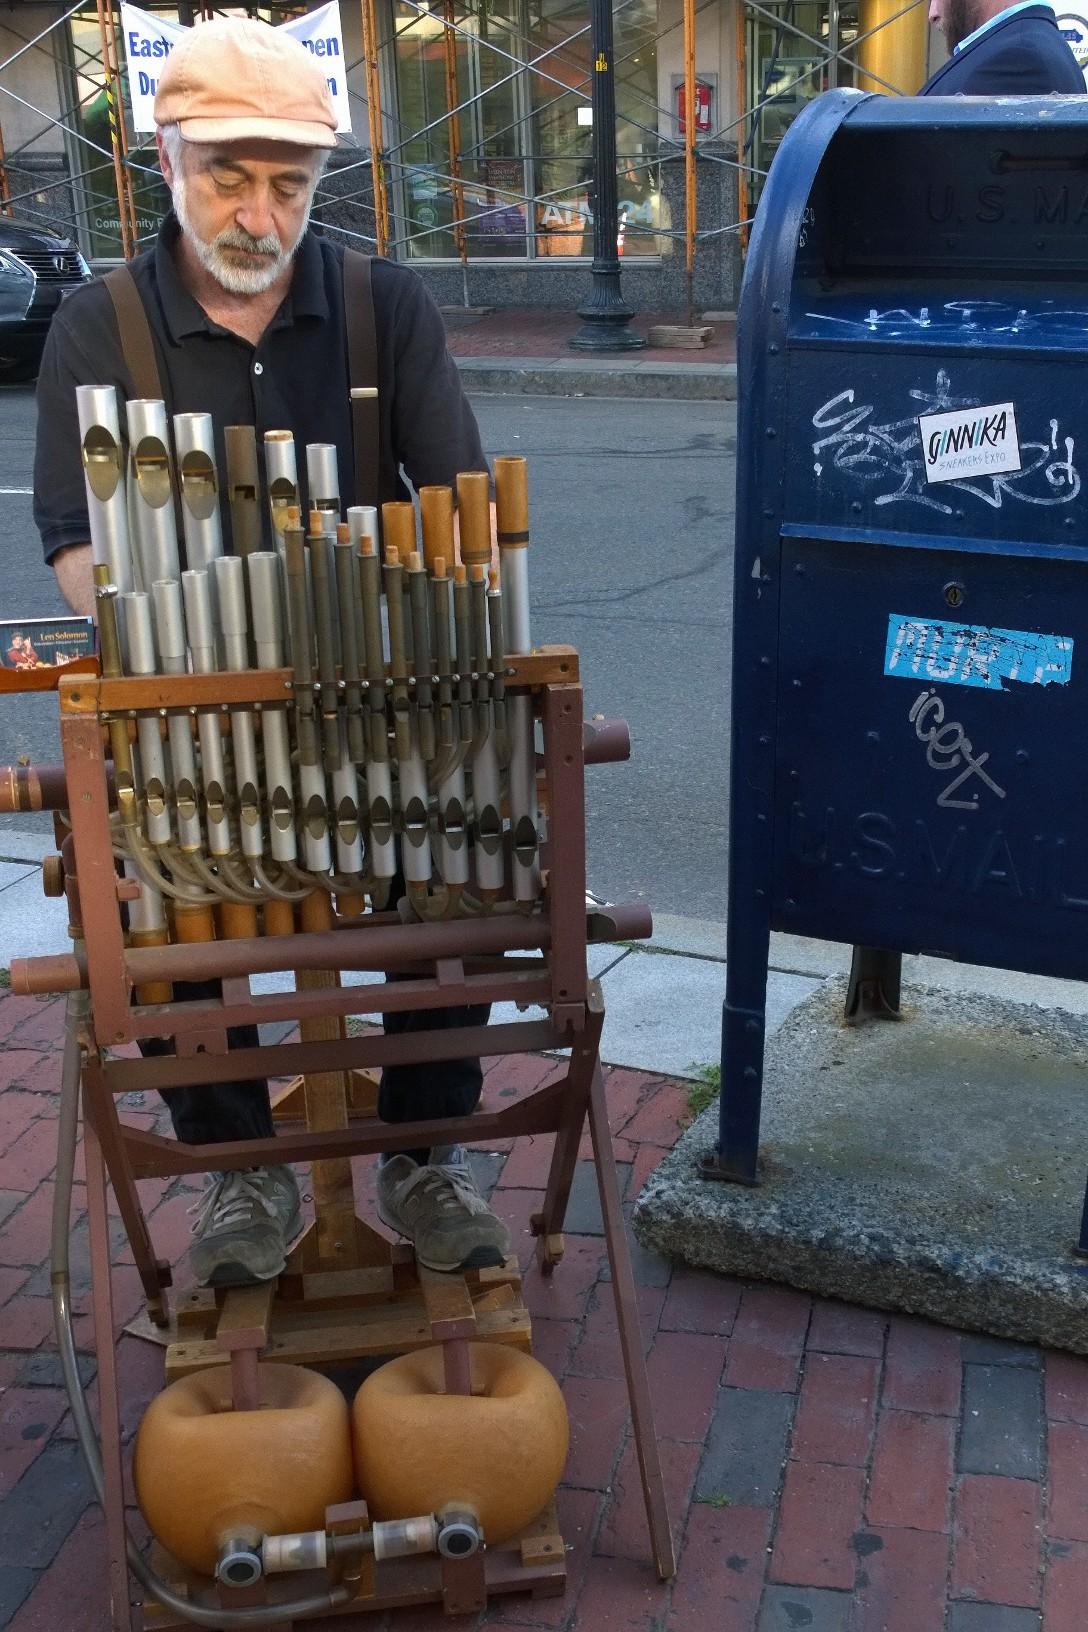 081816-inventor-plays-music-Harvard-Square